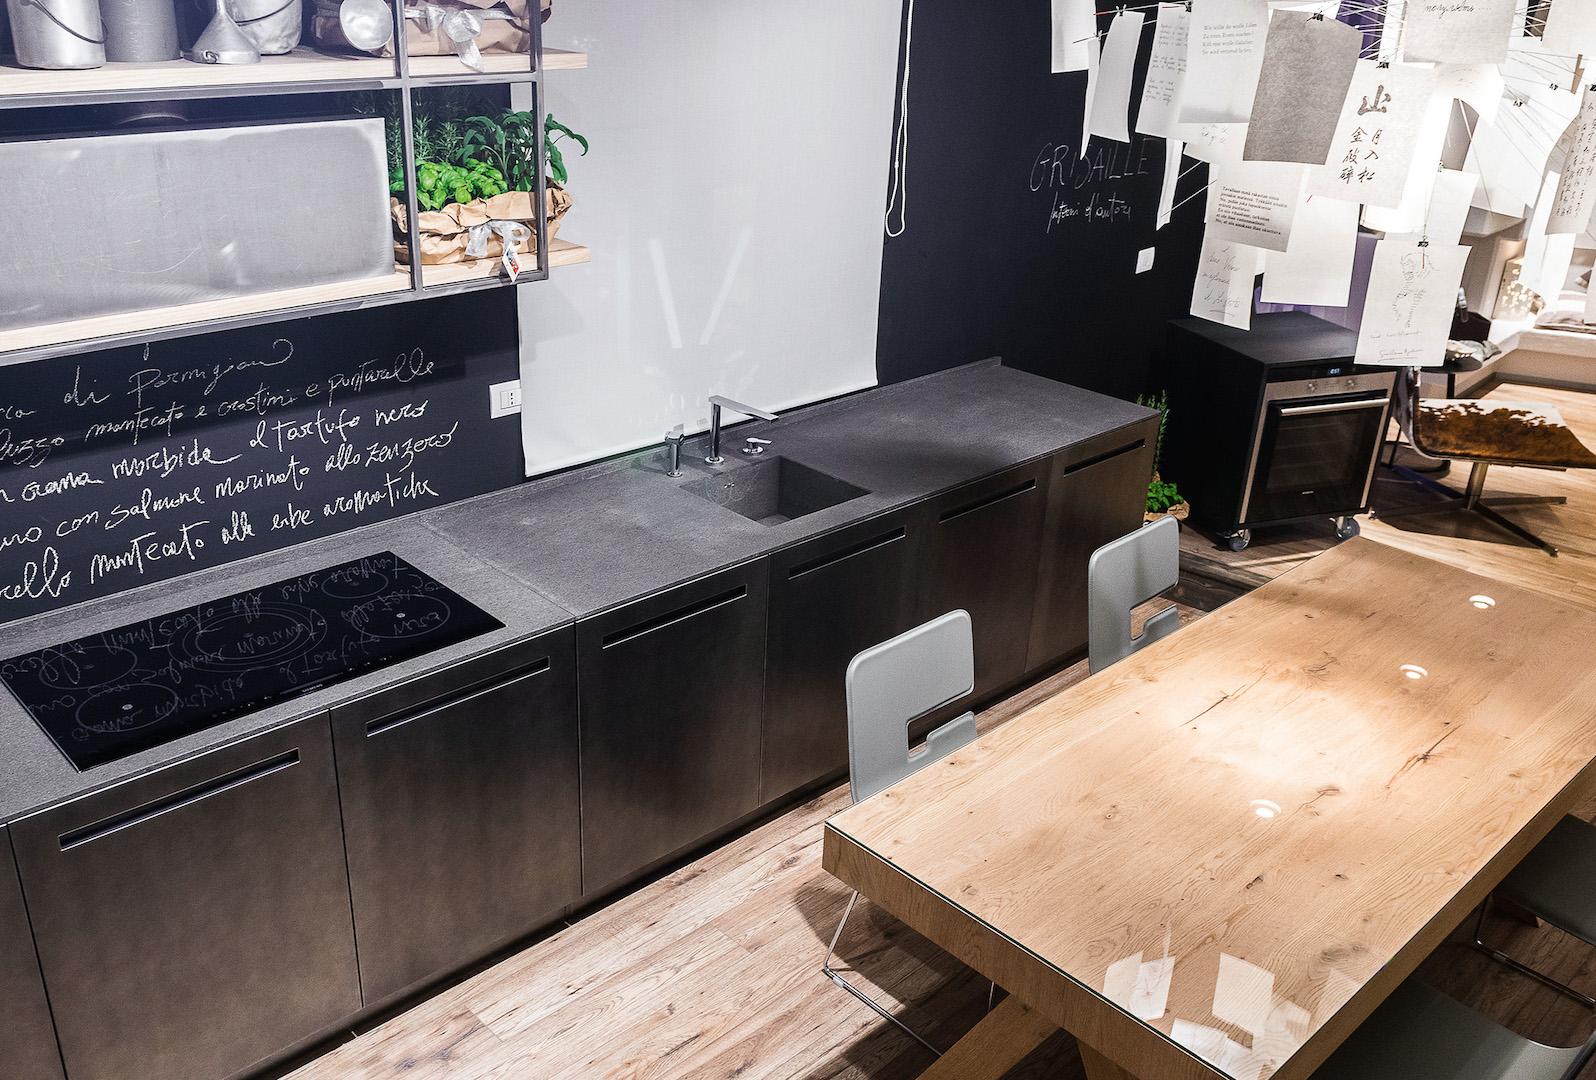 Cucina industriale in metallo e pietra basaltina - Pistoni a gas per ante cucina ...